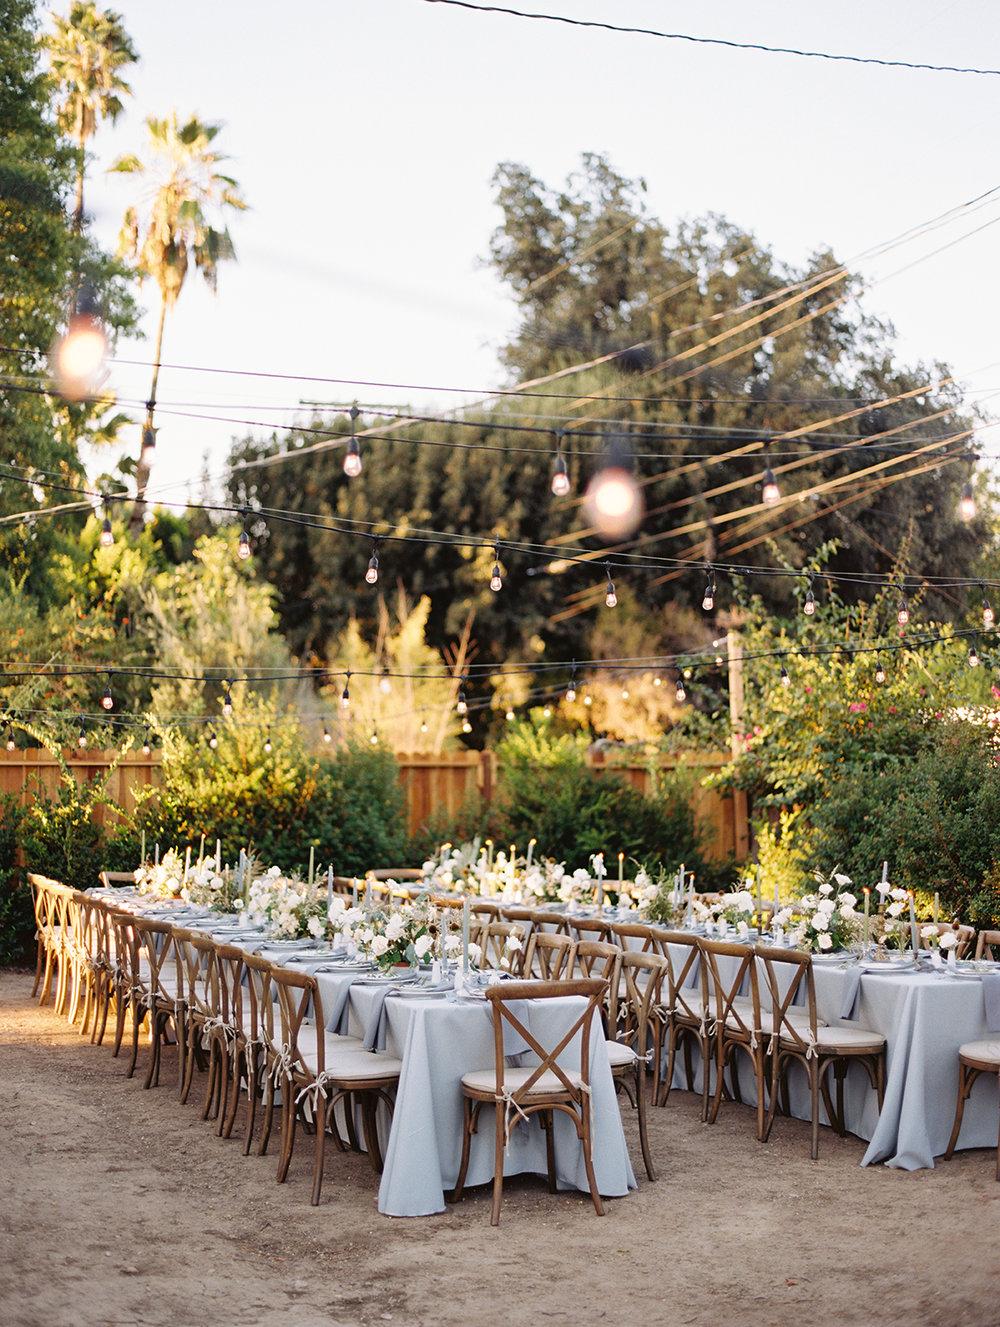 003-brian-sarra-los-angeles-wedding-brumley-wells-photography.jpg